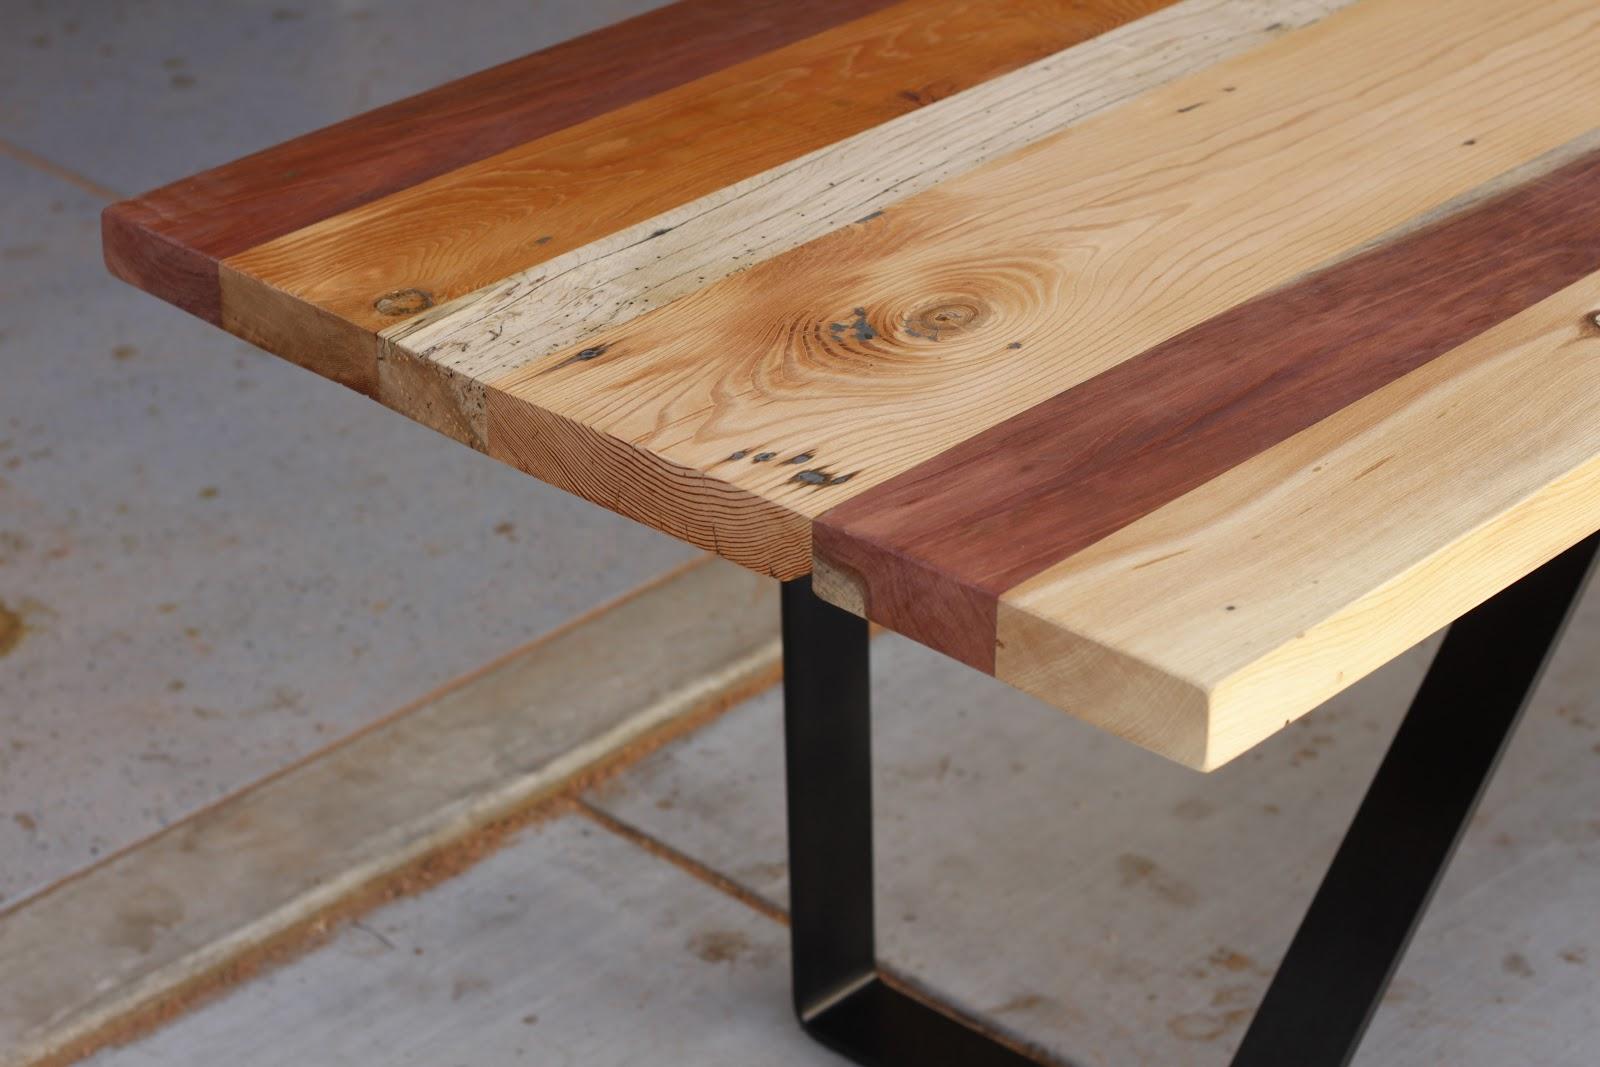 Redwood Slab Dining Table Arbor Exchange Reclaimed Wood Furniture 10 Ft Patchwork